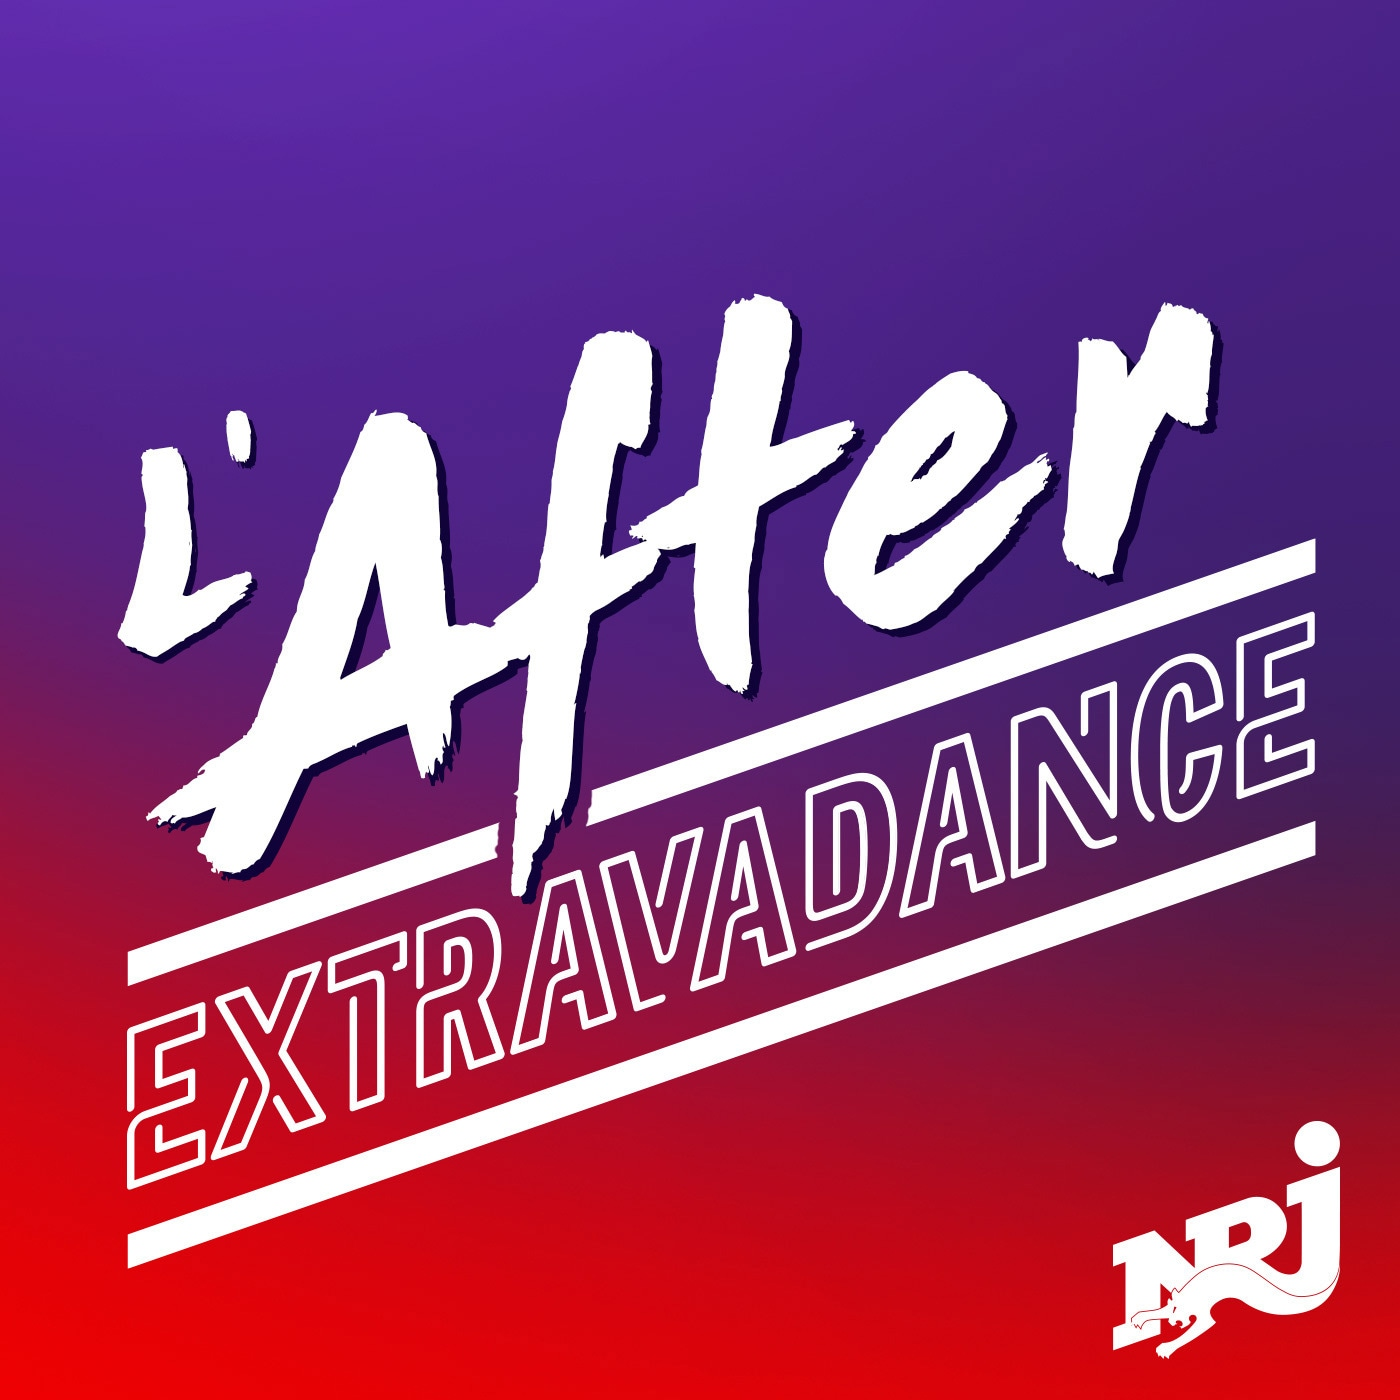 L'After Extravadance